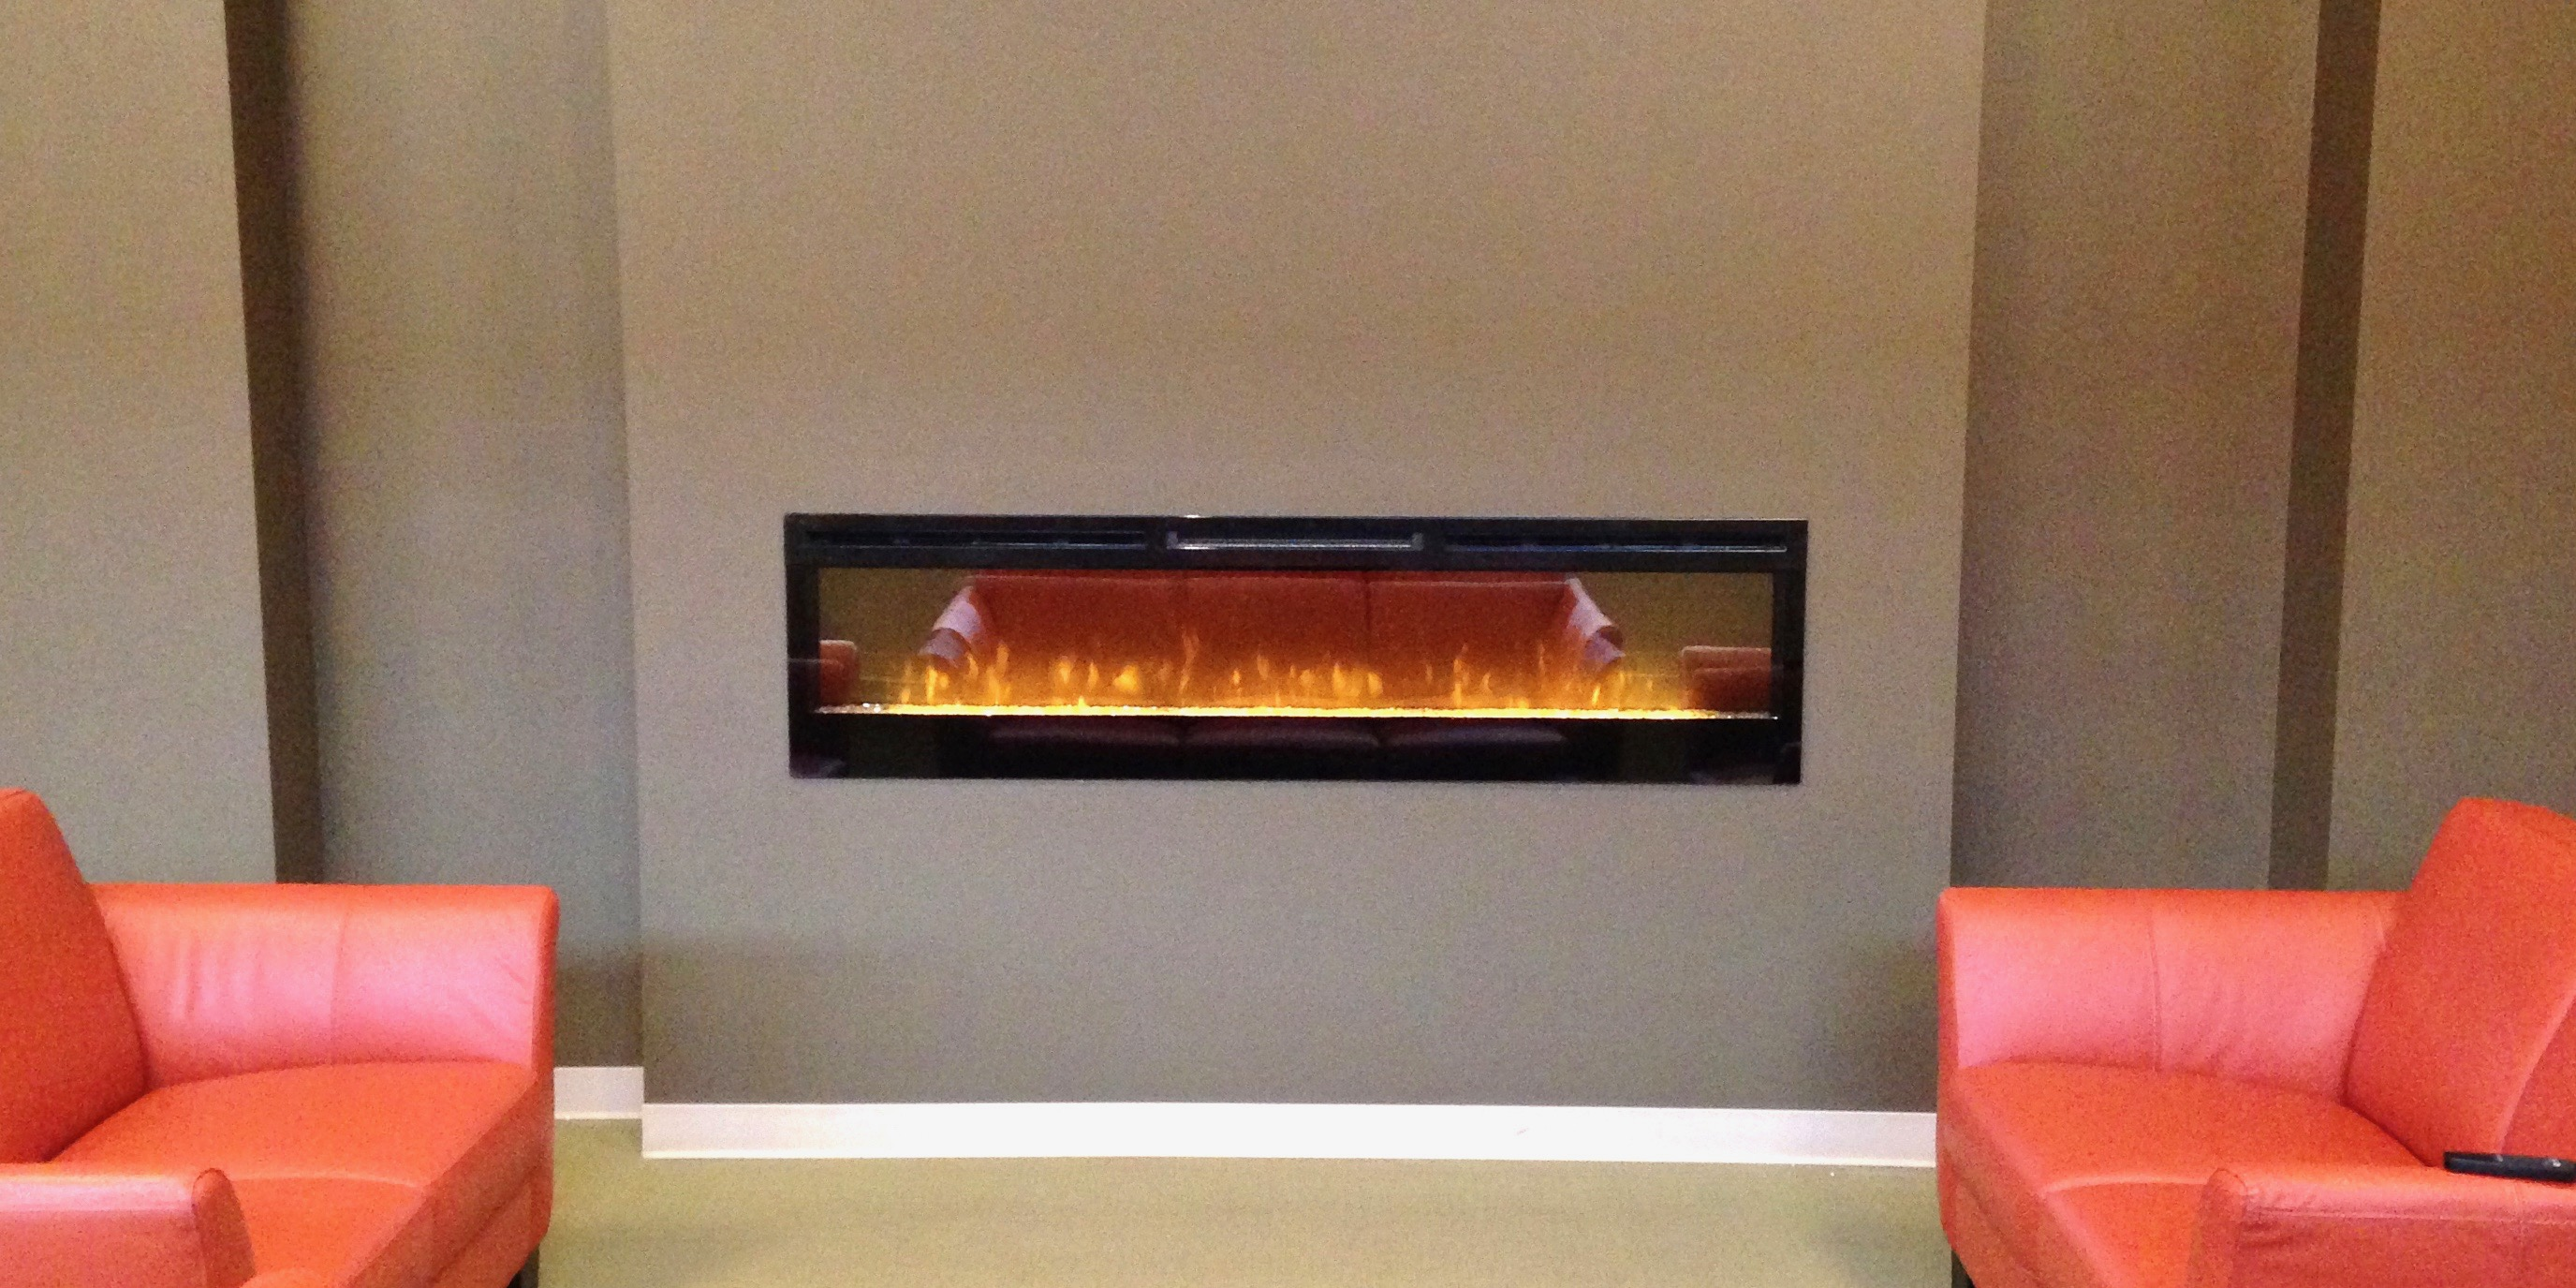 Wondrous Electric Fireplaces Builders Fireplace Company Interior Design Ideas Skatsoteloinfo